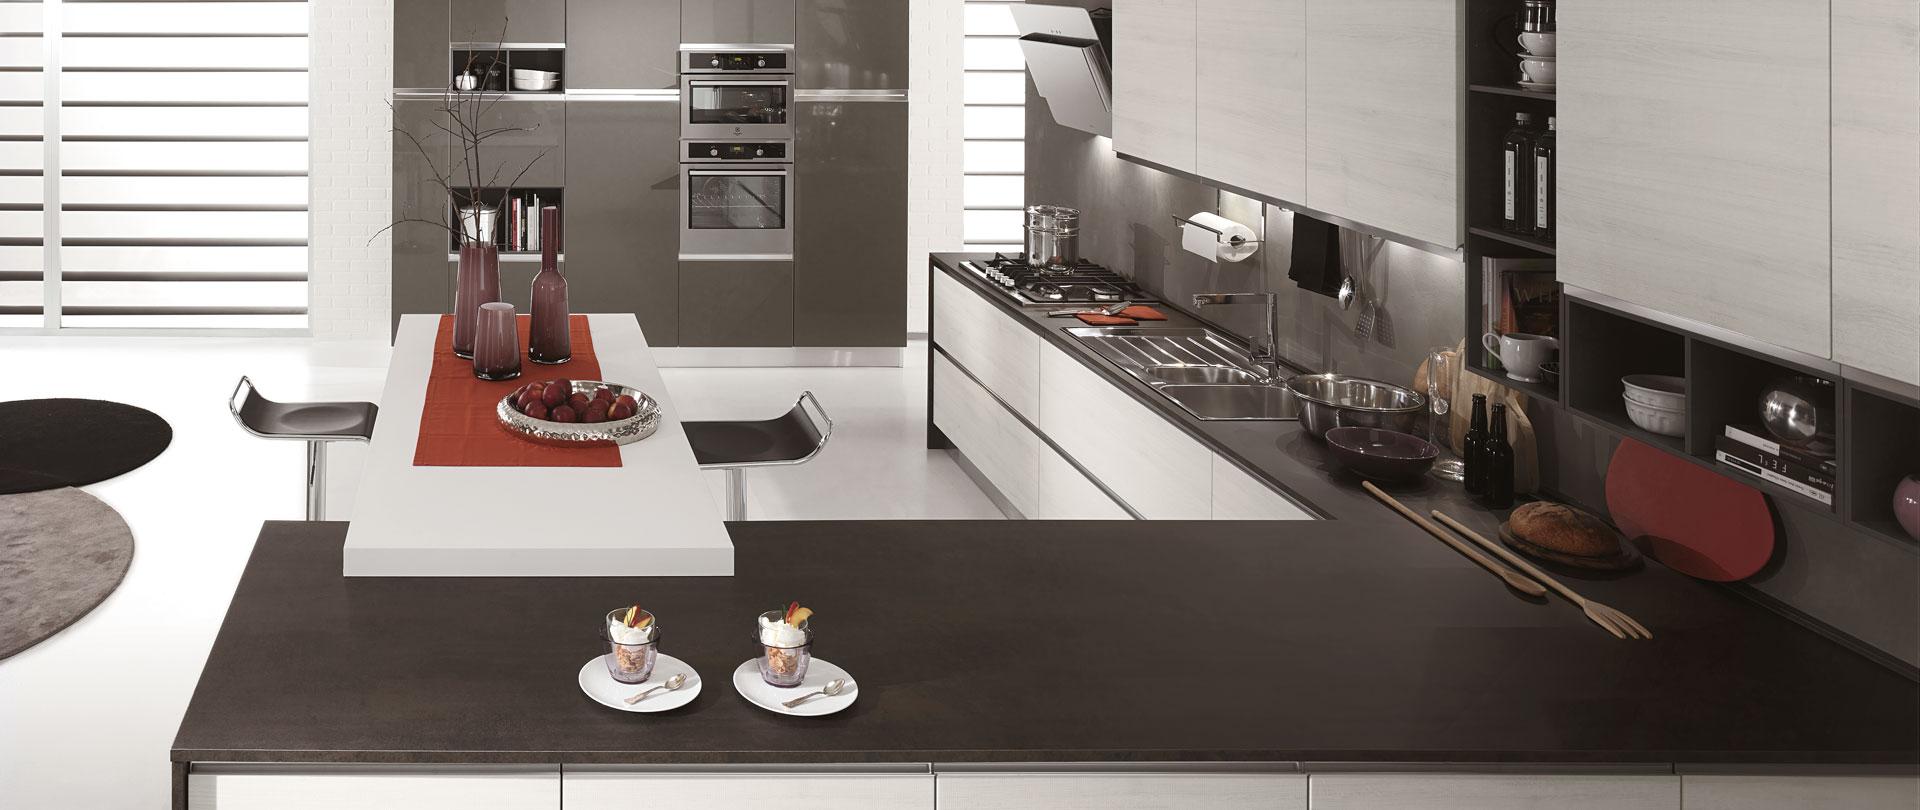 New Meg – Cucina Moderna Mobilturi